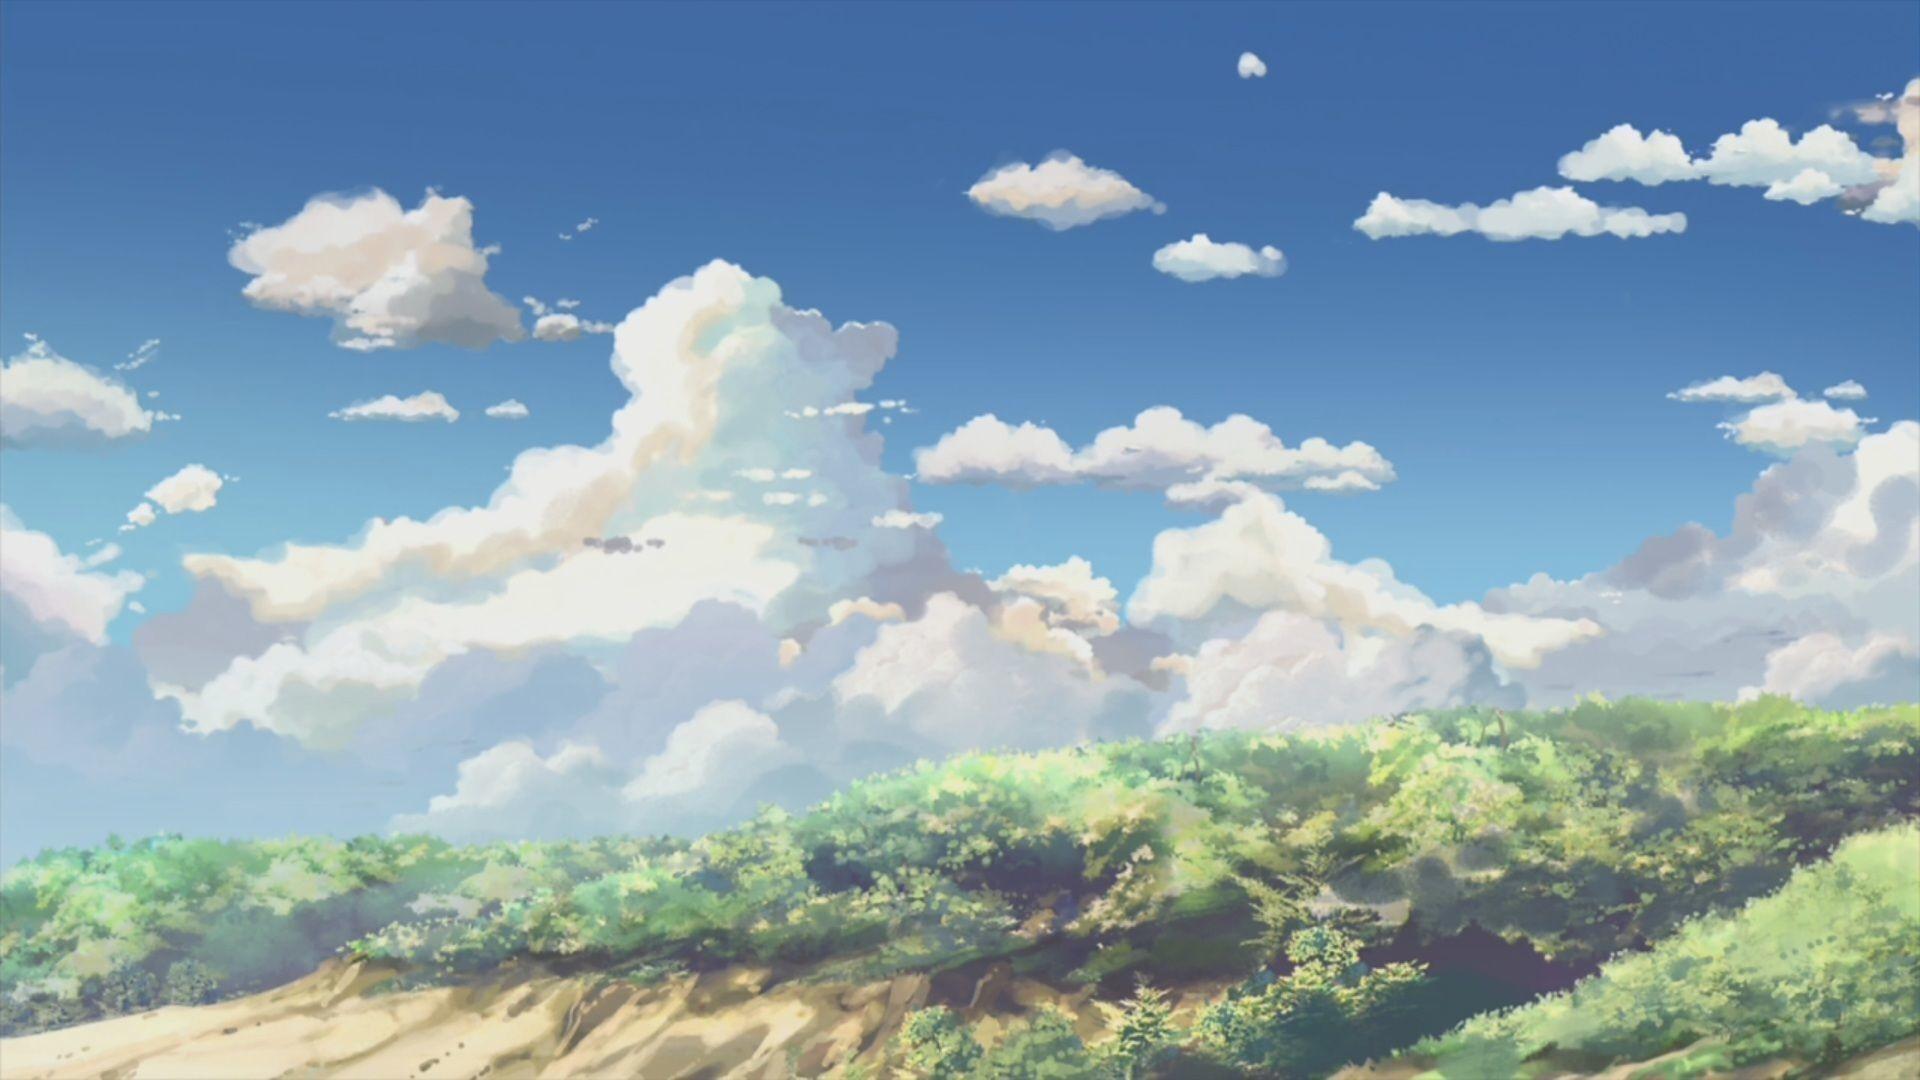 Anime Cloud Free Download Wallpaper